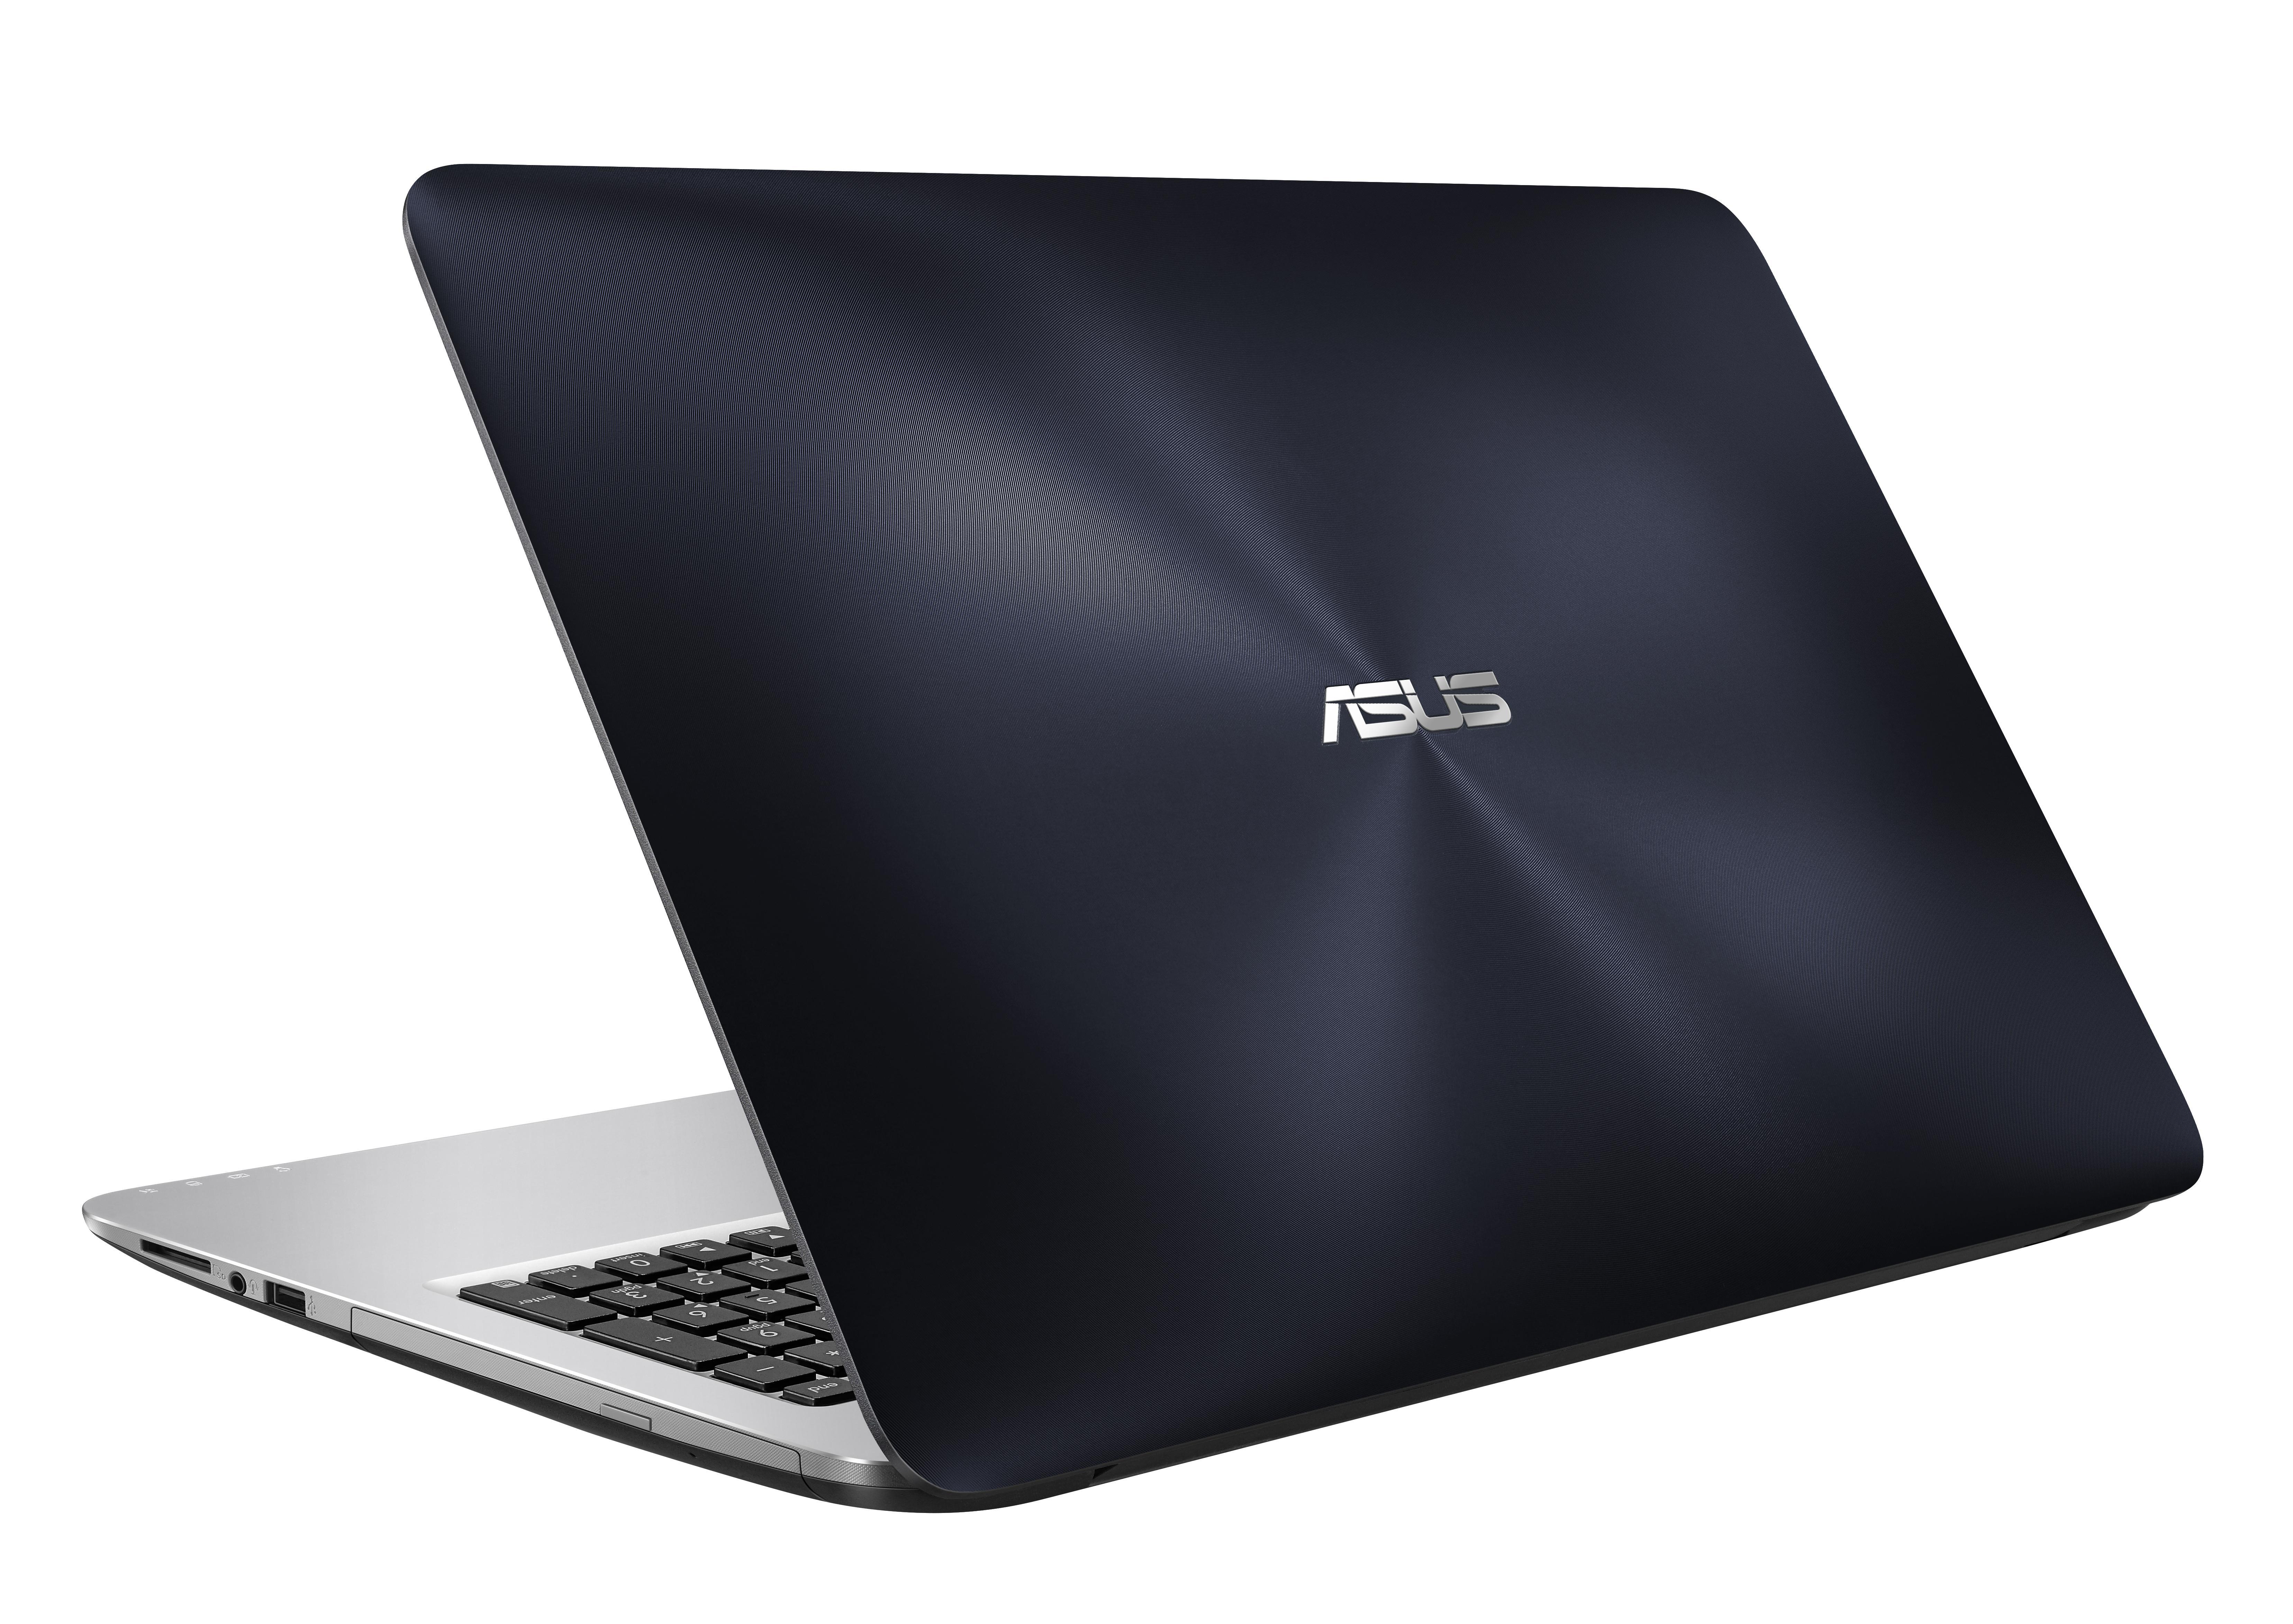 "ASUS A556UA-DM988D 2.50GHz i5-7200U 15.6"" 1920 x 1080Pixel Blu, Acciaio inossidabile Computer portatile notebook/portatile"